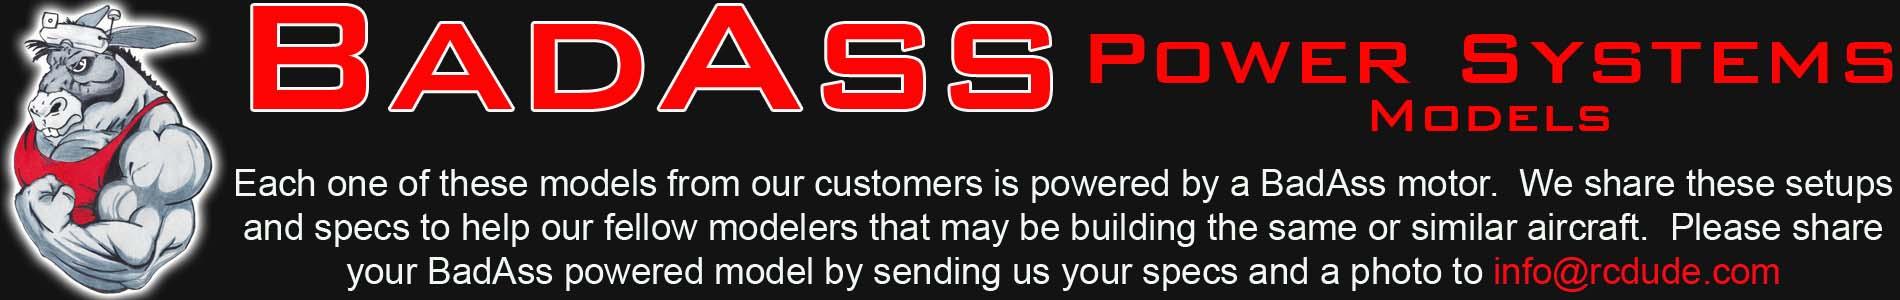 BadAss Powered Models Webpage